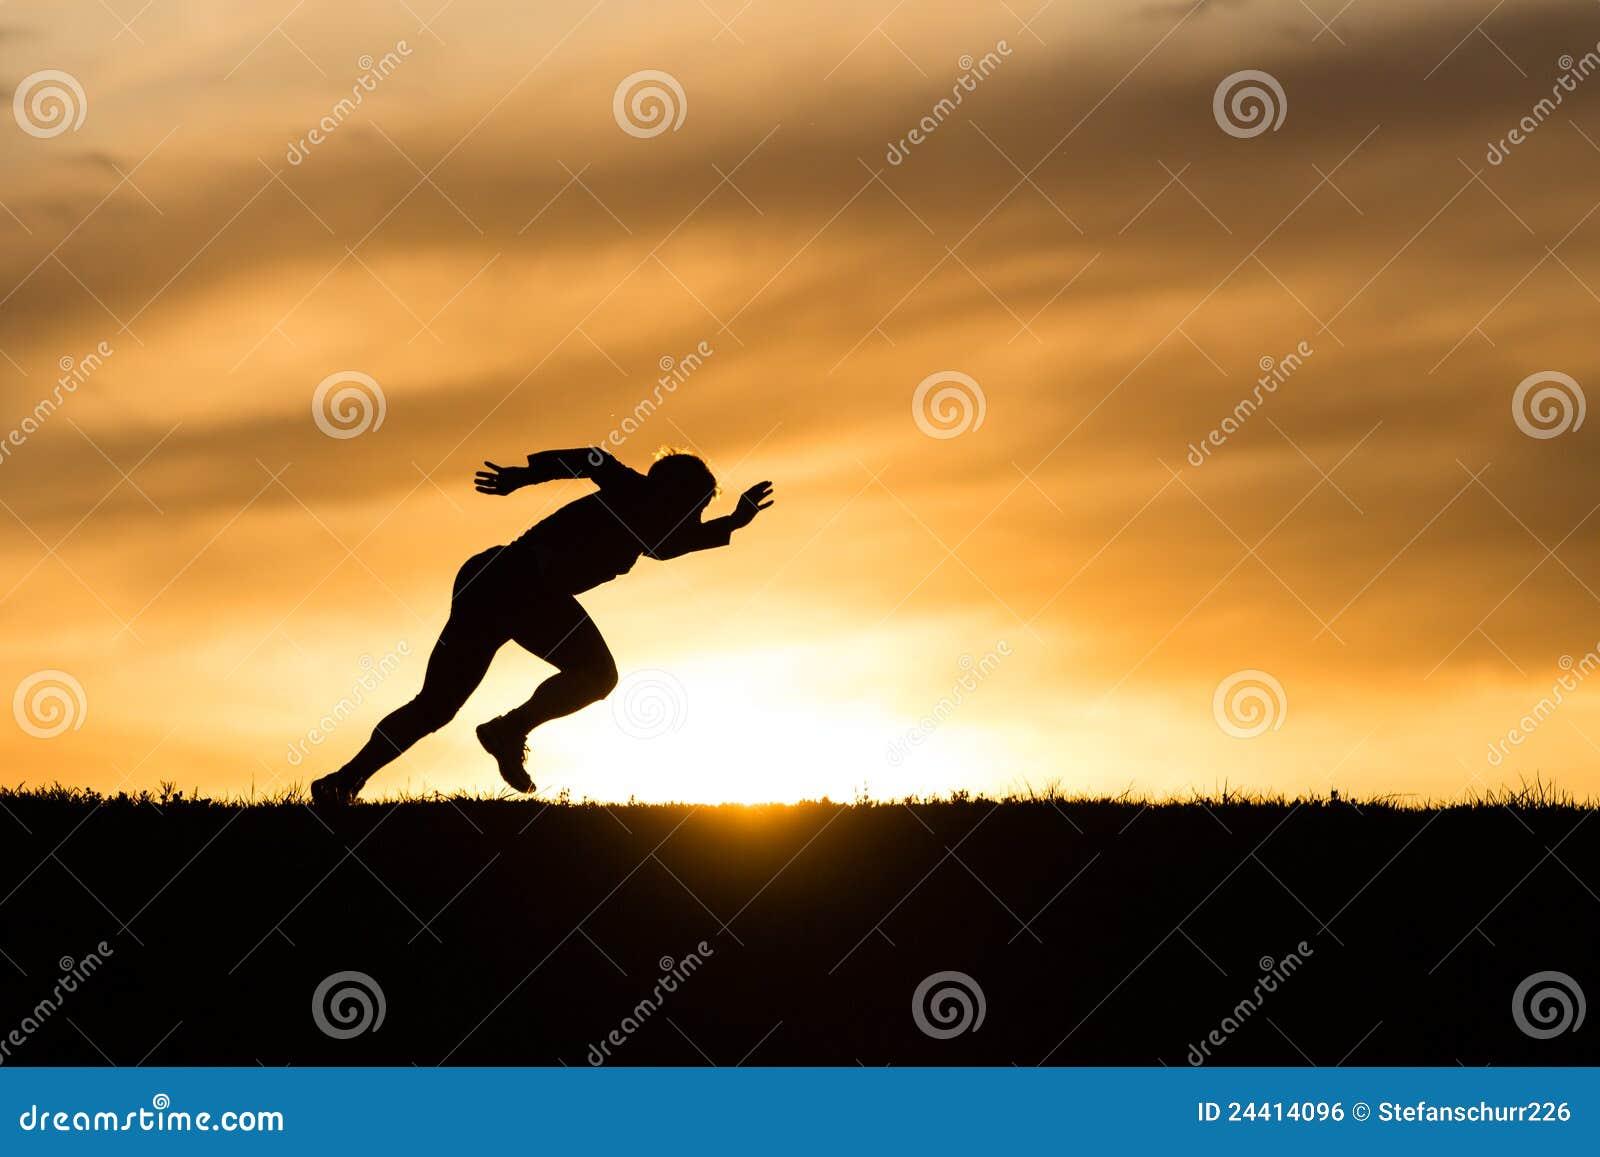 Silhouette d un sprinter